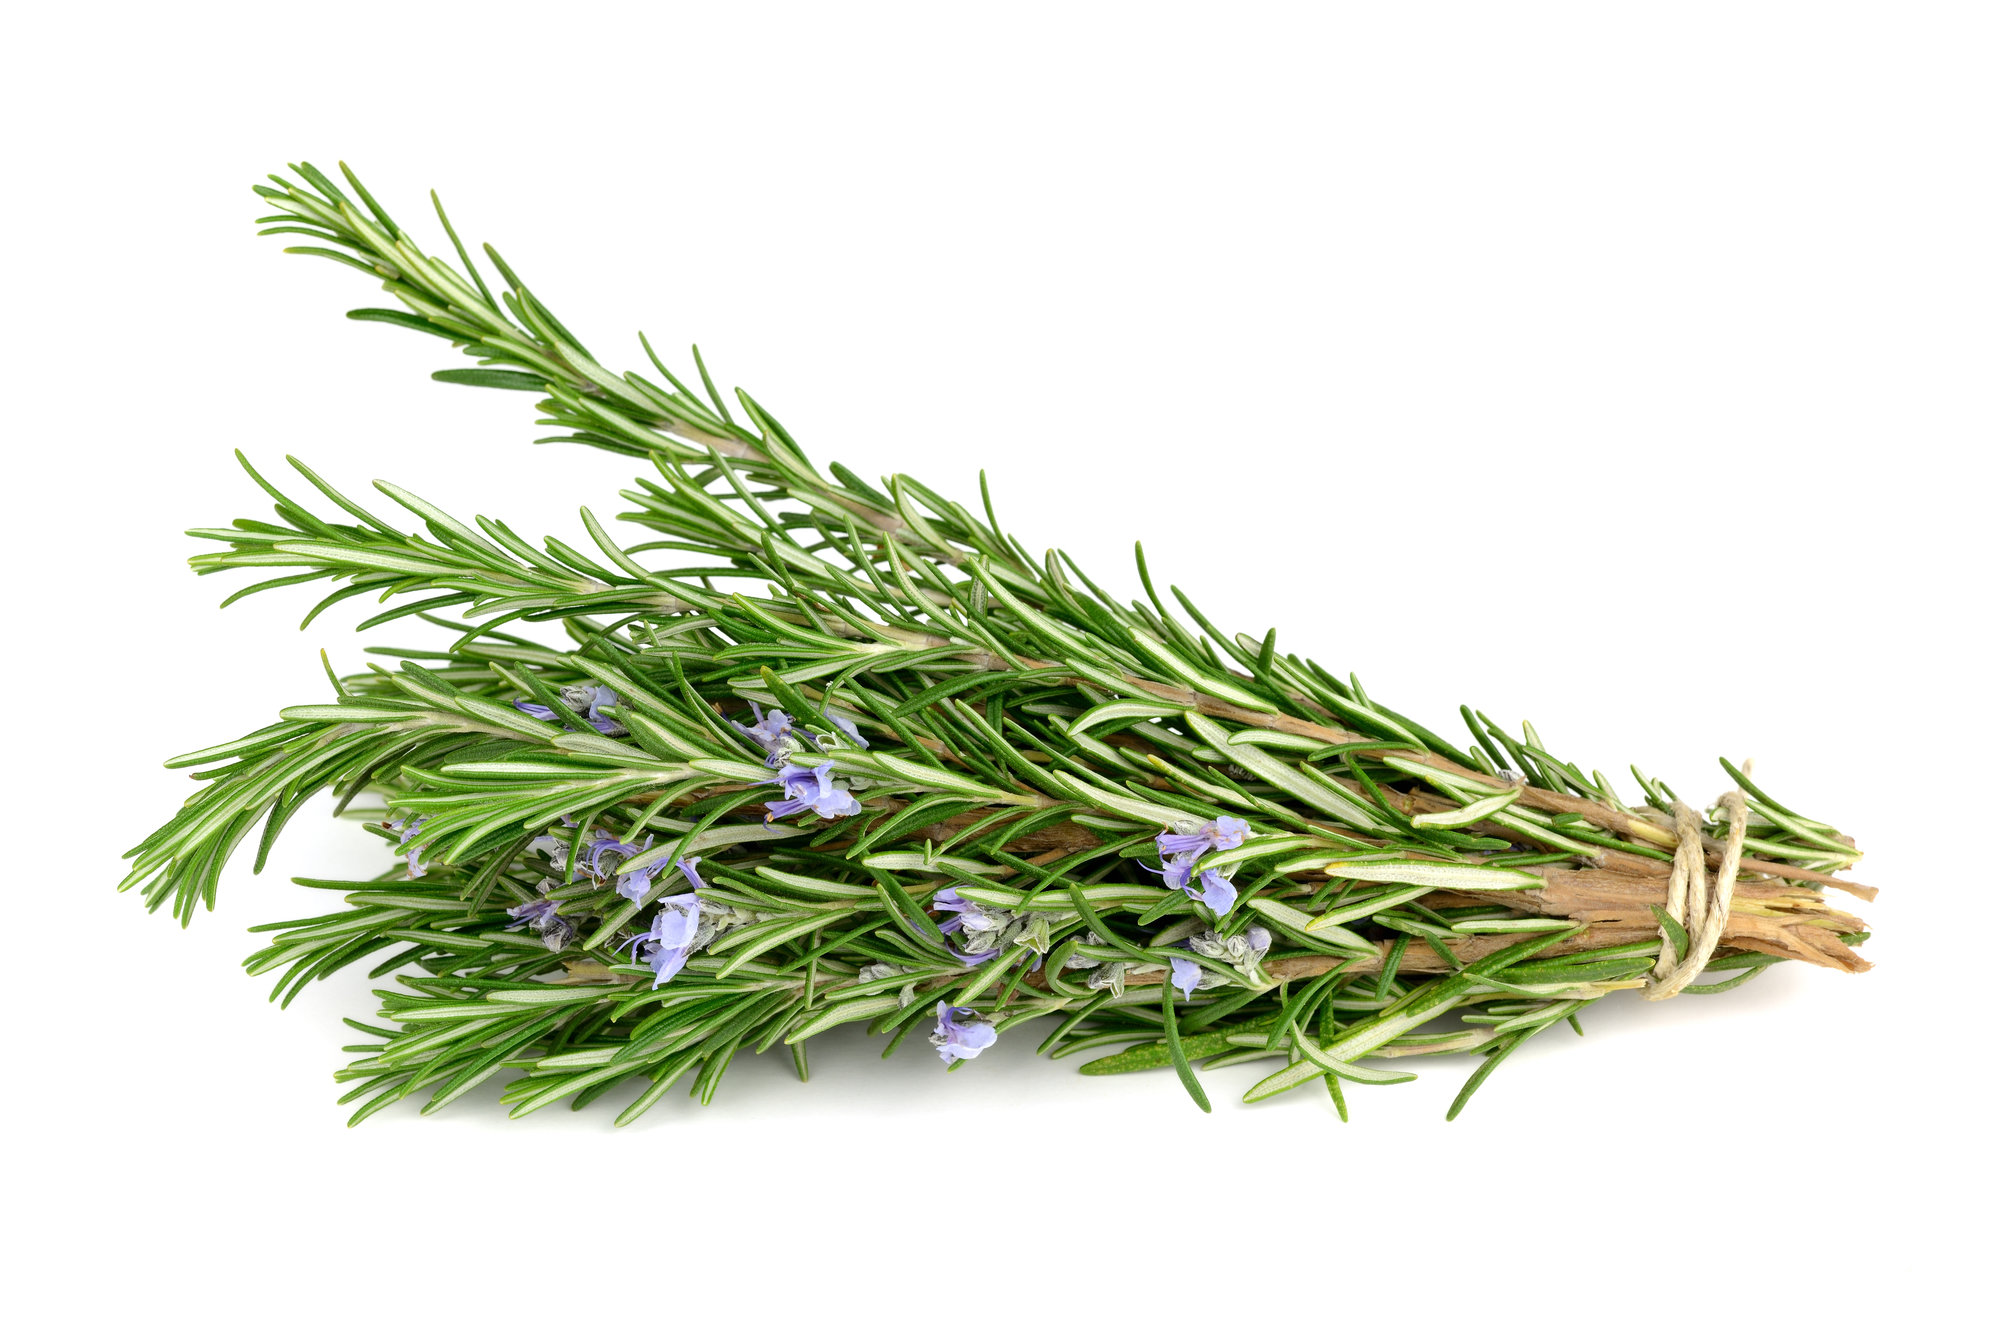 Rosemary (Rosmarinus officinalis) Essential Oil  - 15ml EO-ROSMAR15